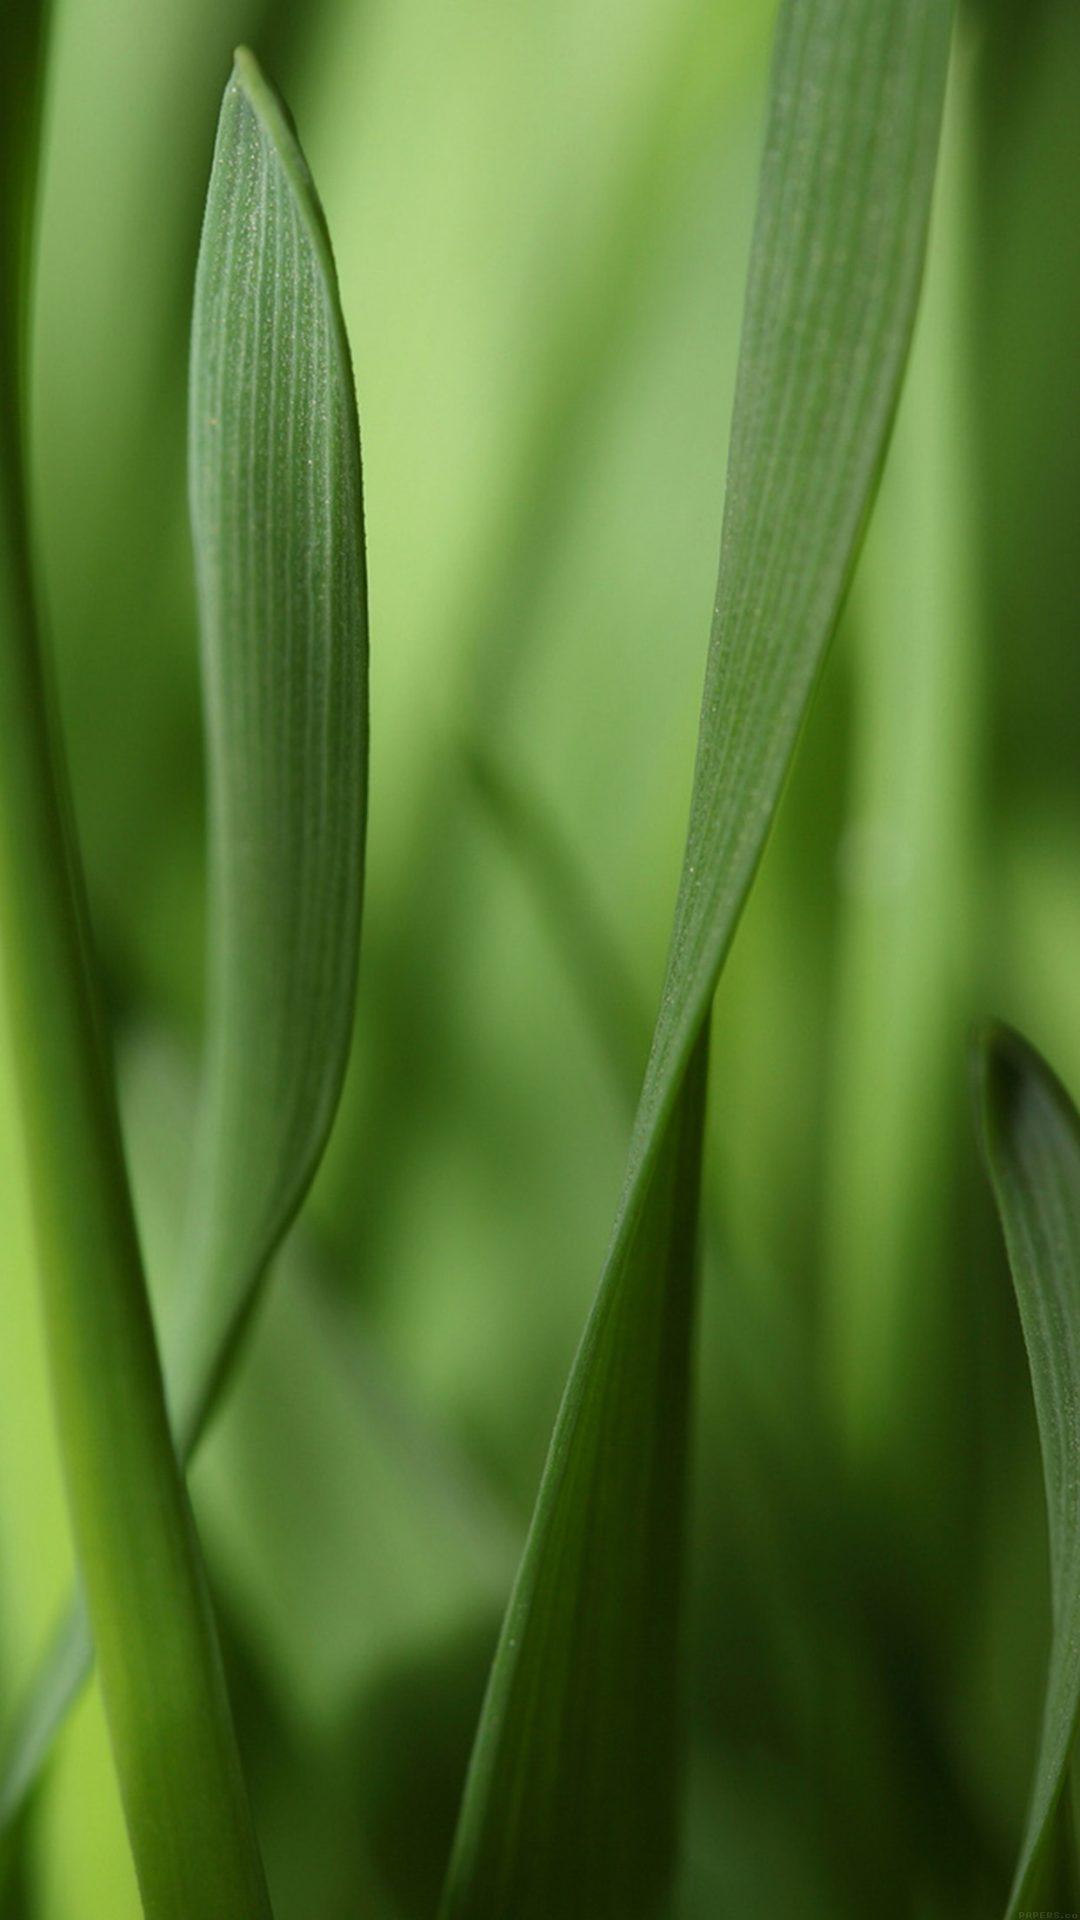 Leaf Grass Bokeh Nature